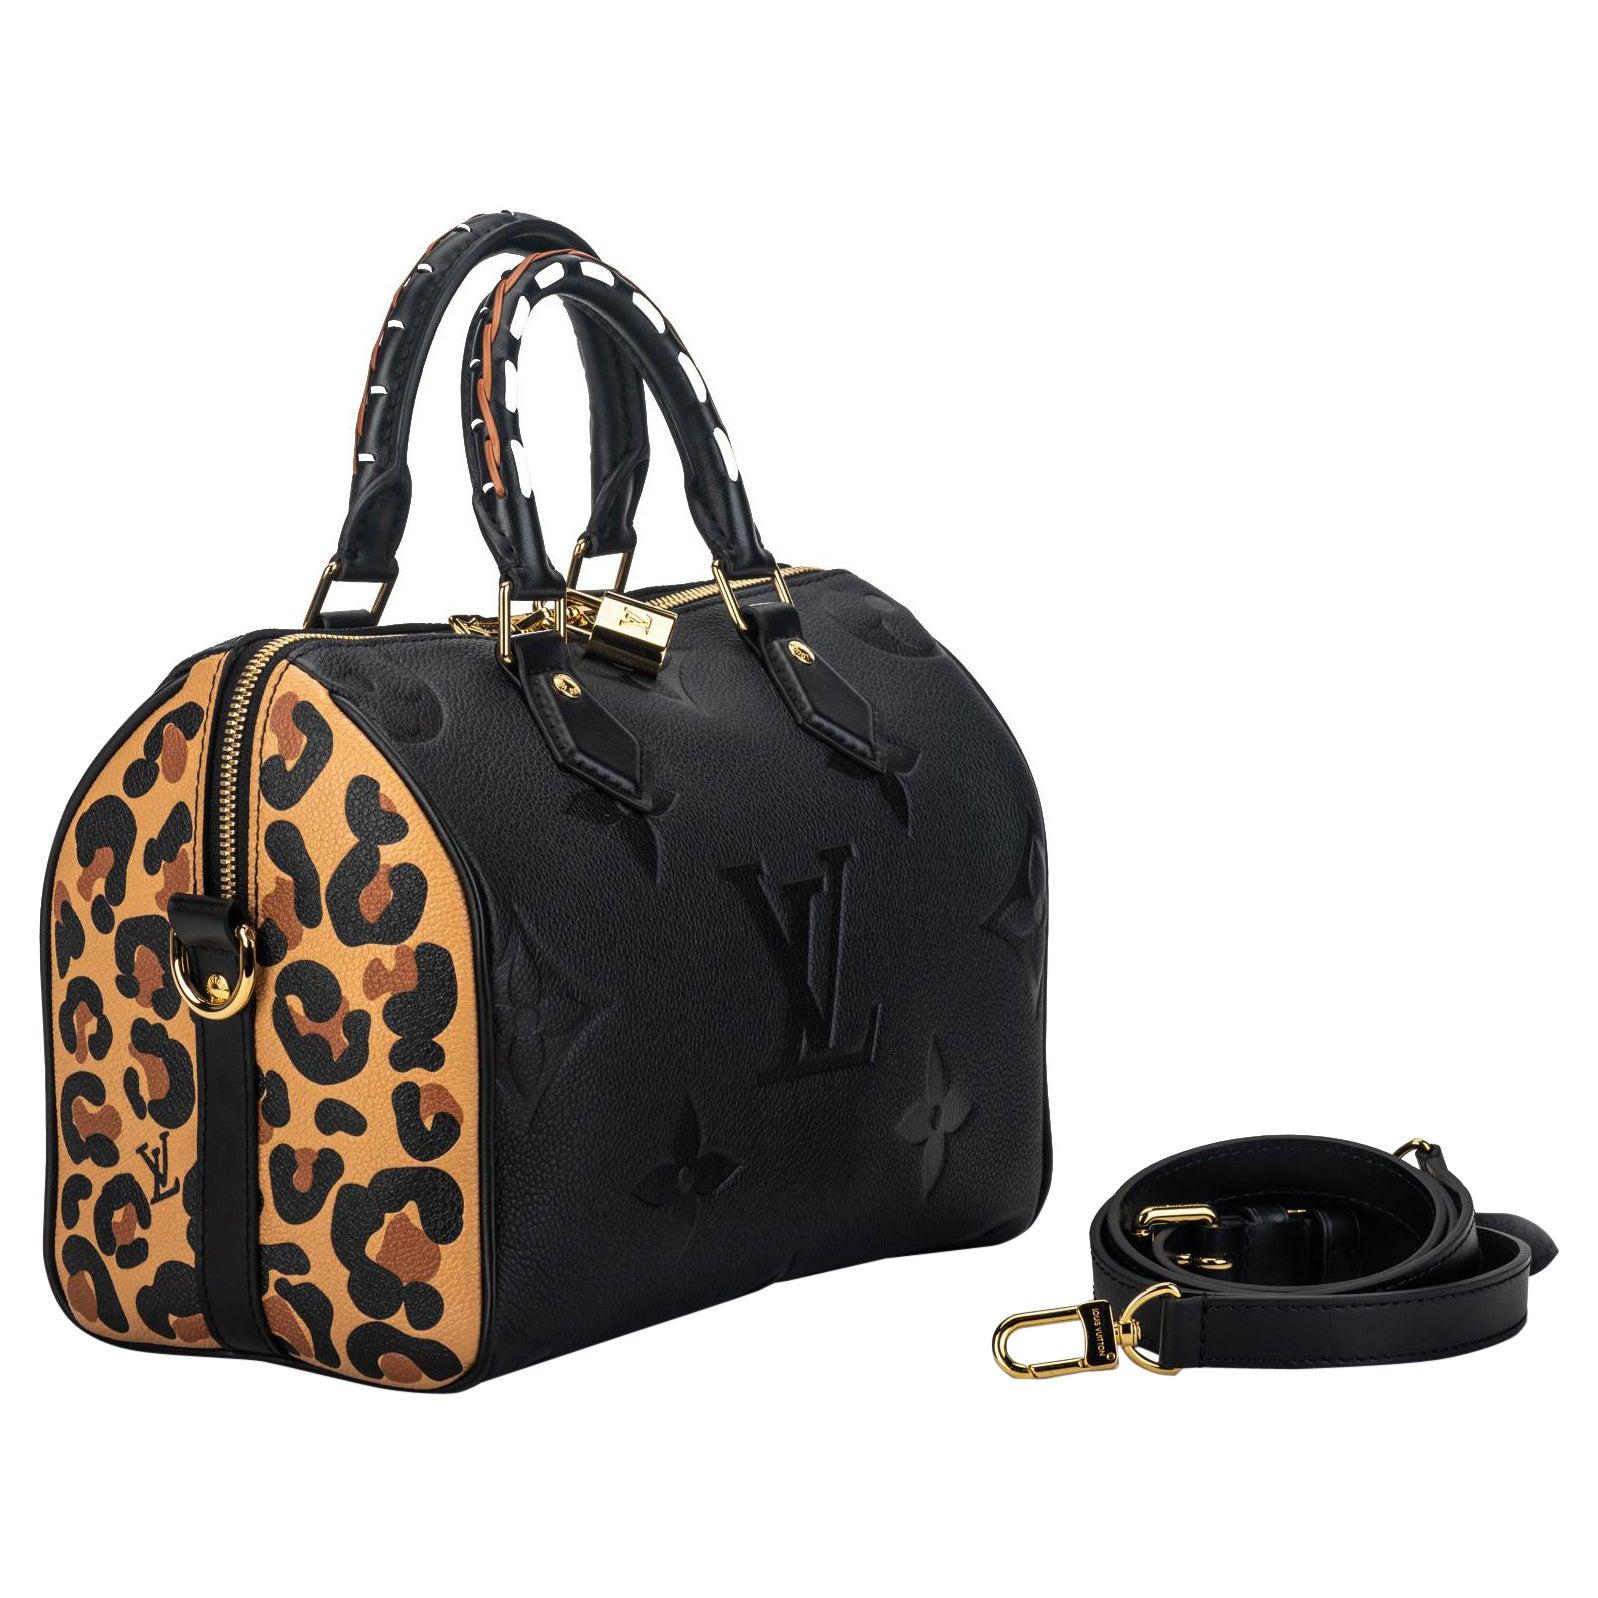 New Louis Vuitton Wild At Heart Speedy Bag 25